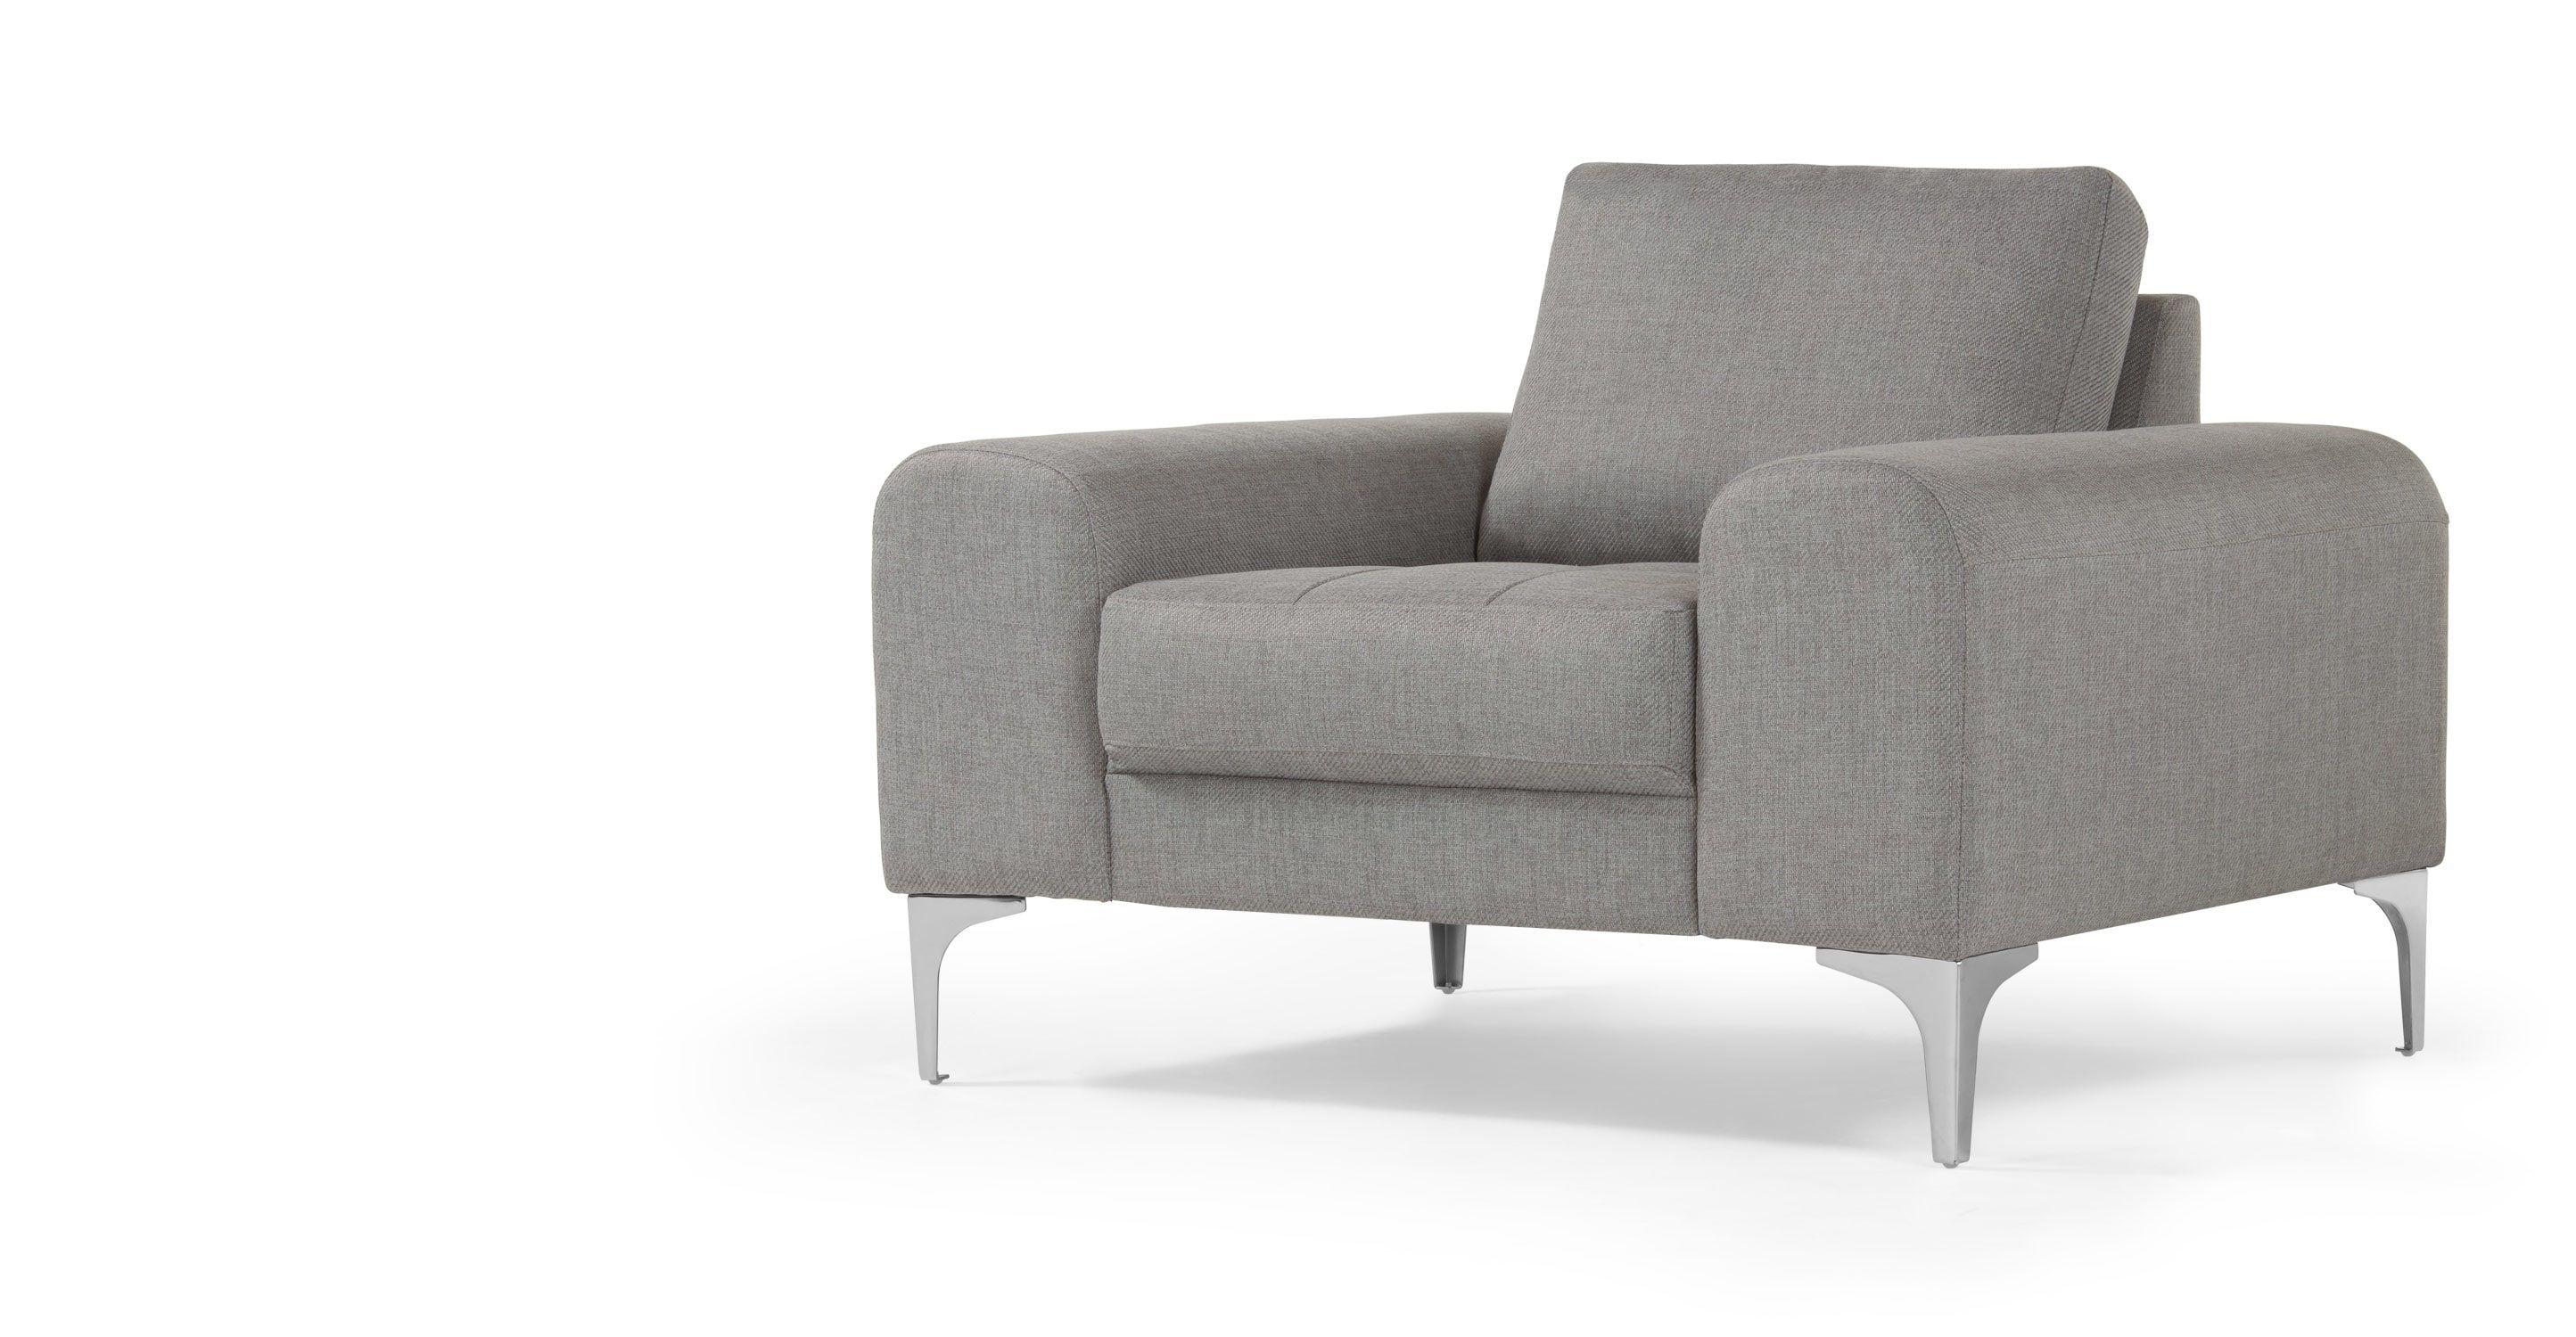 Bemerkenswert Sessel Bequem Ideen Von Vittorio Sessel, Perlgrau